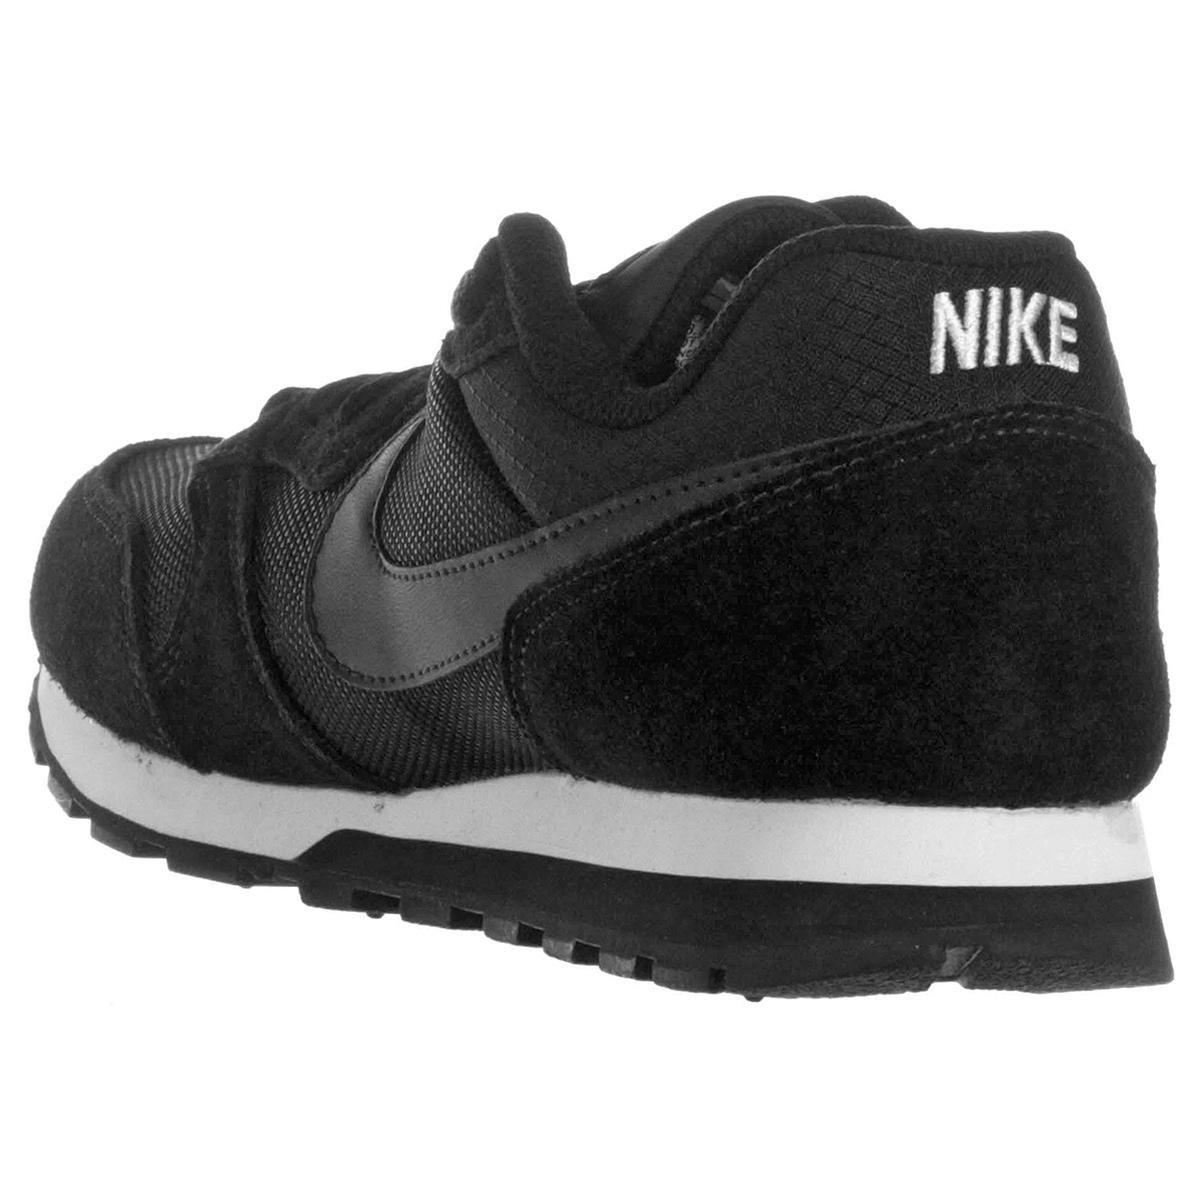 Tênis Nike Md Runner 2 Feminino - Preto e Branco - Compre Agora ... 0db944afe11aa